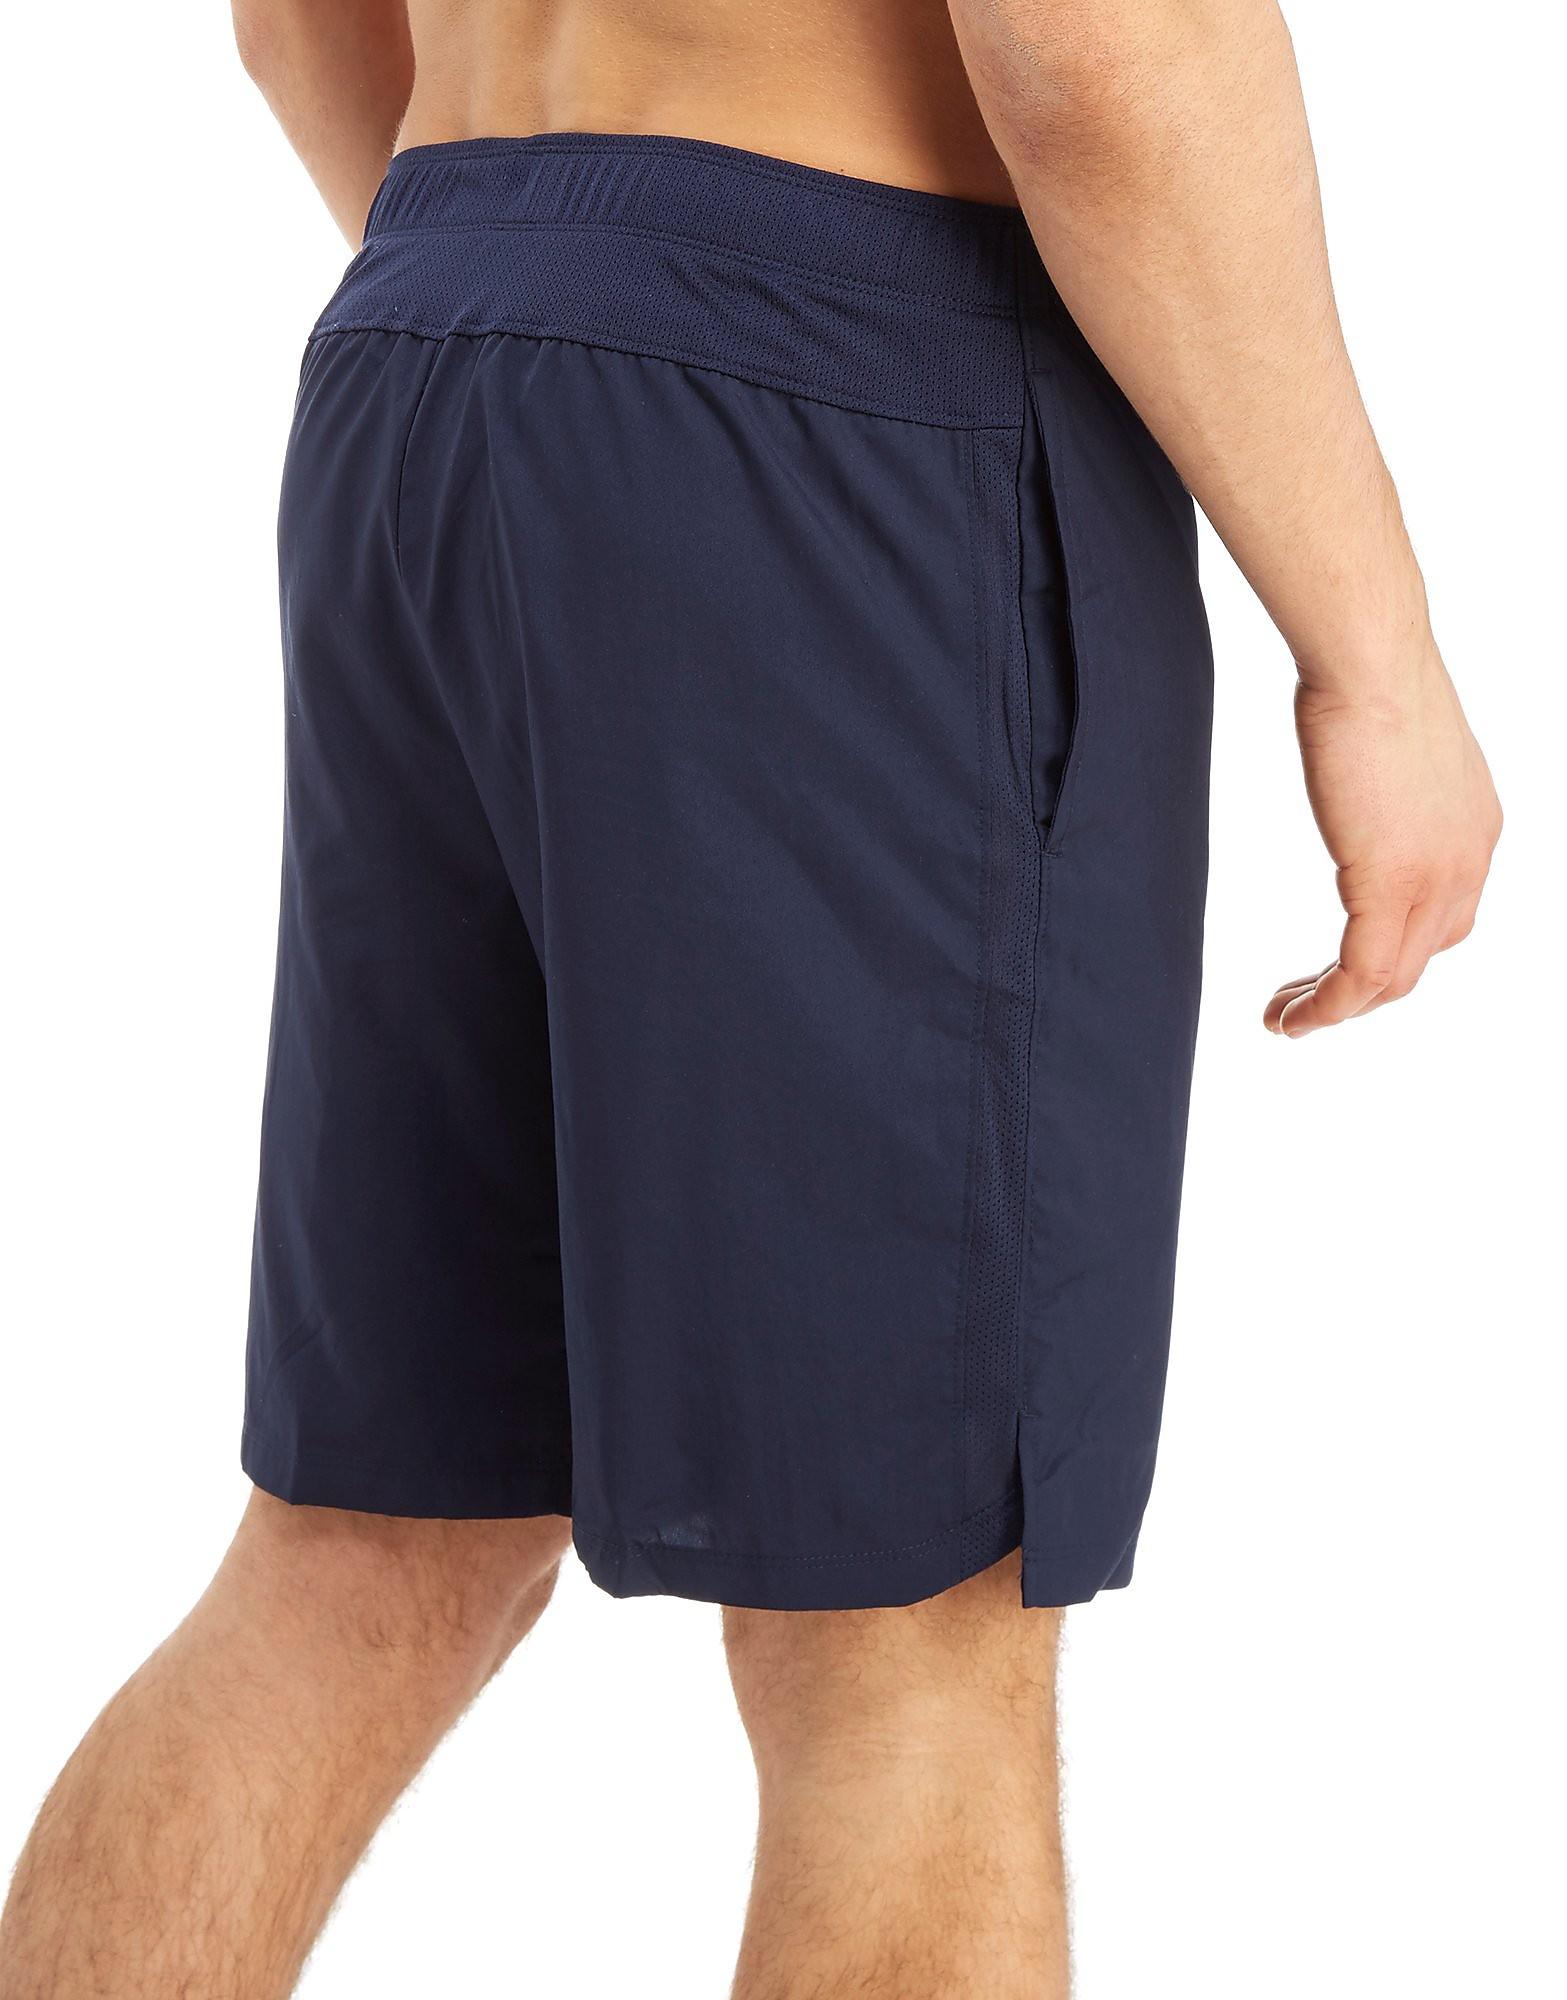 "Nike Short 9"" Challenge"